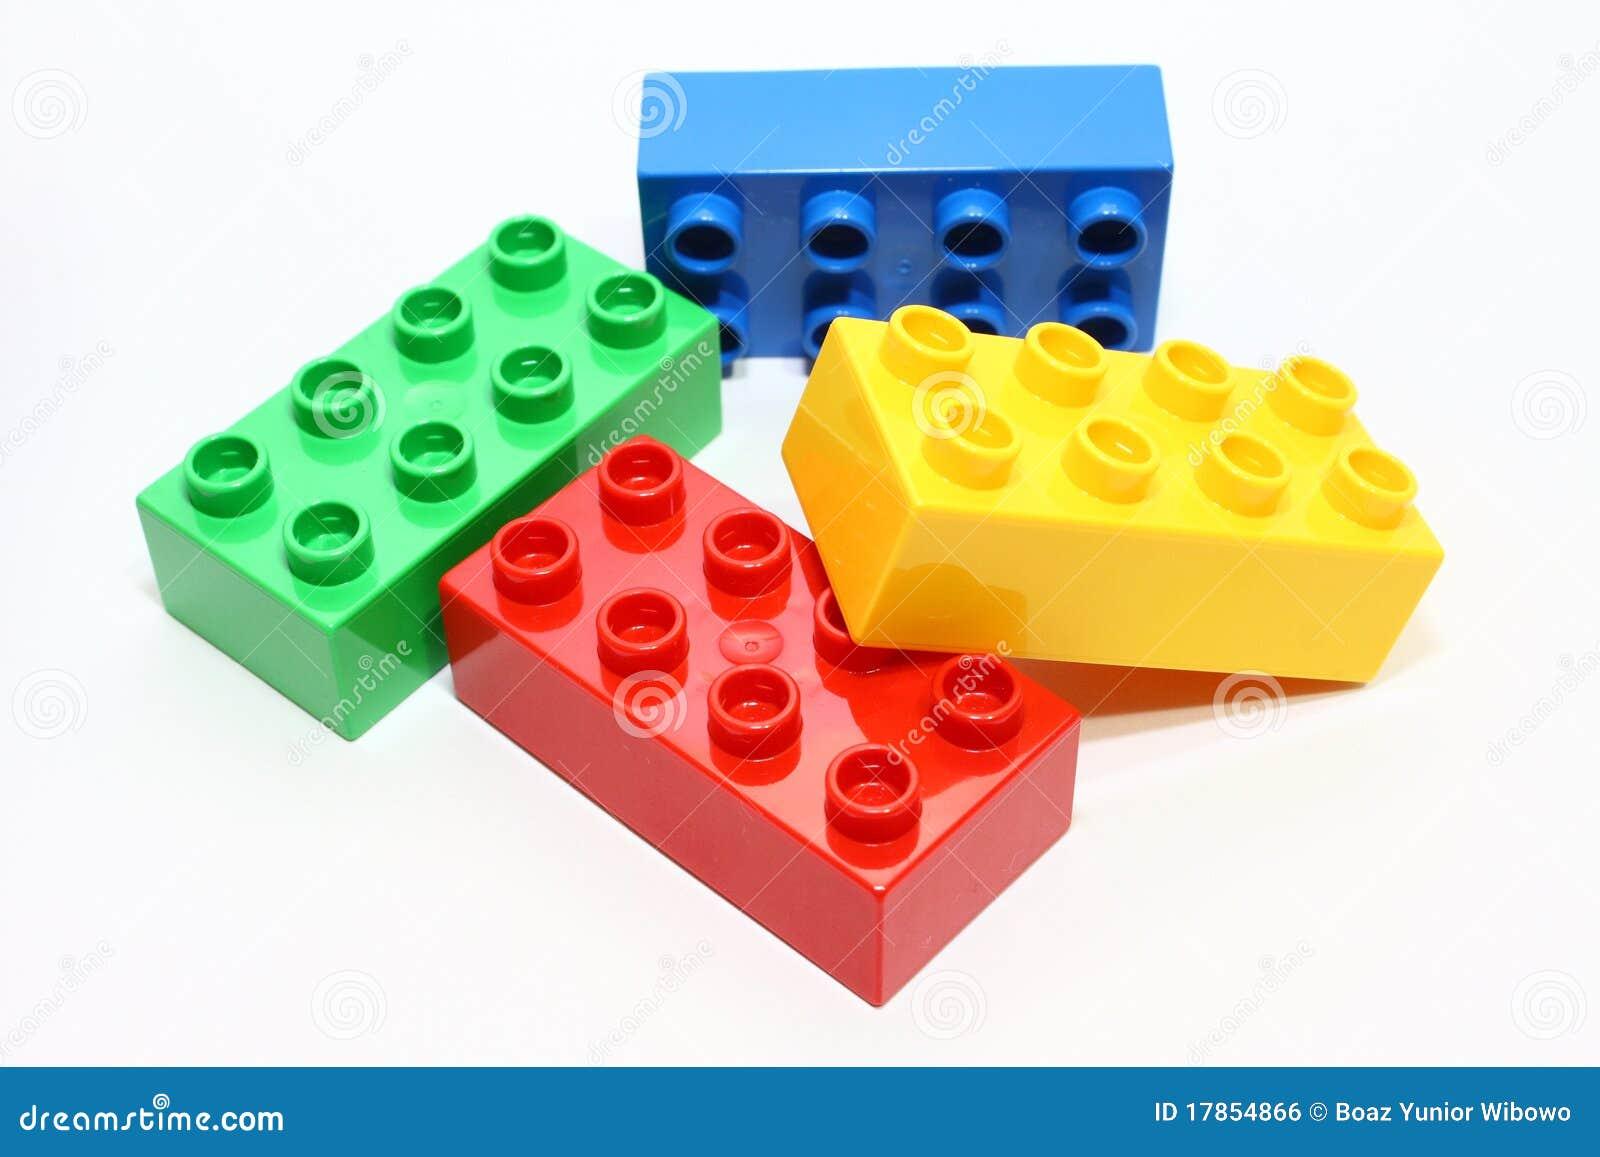 color lego blocks stock illustration illustration of isolated 17854866. Black Bedroom Furniture Sets. Home Design Ideas